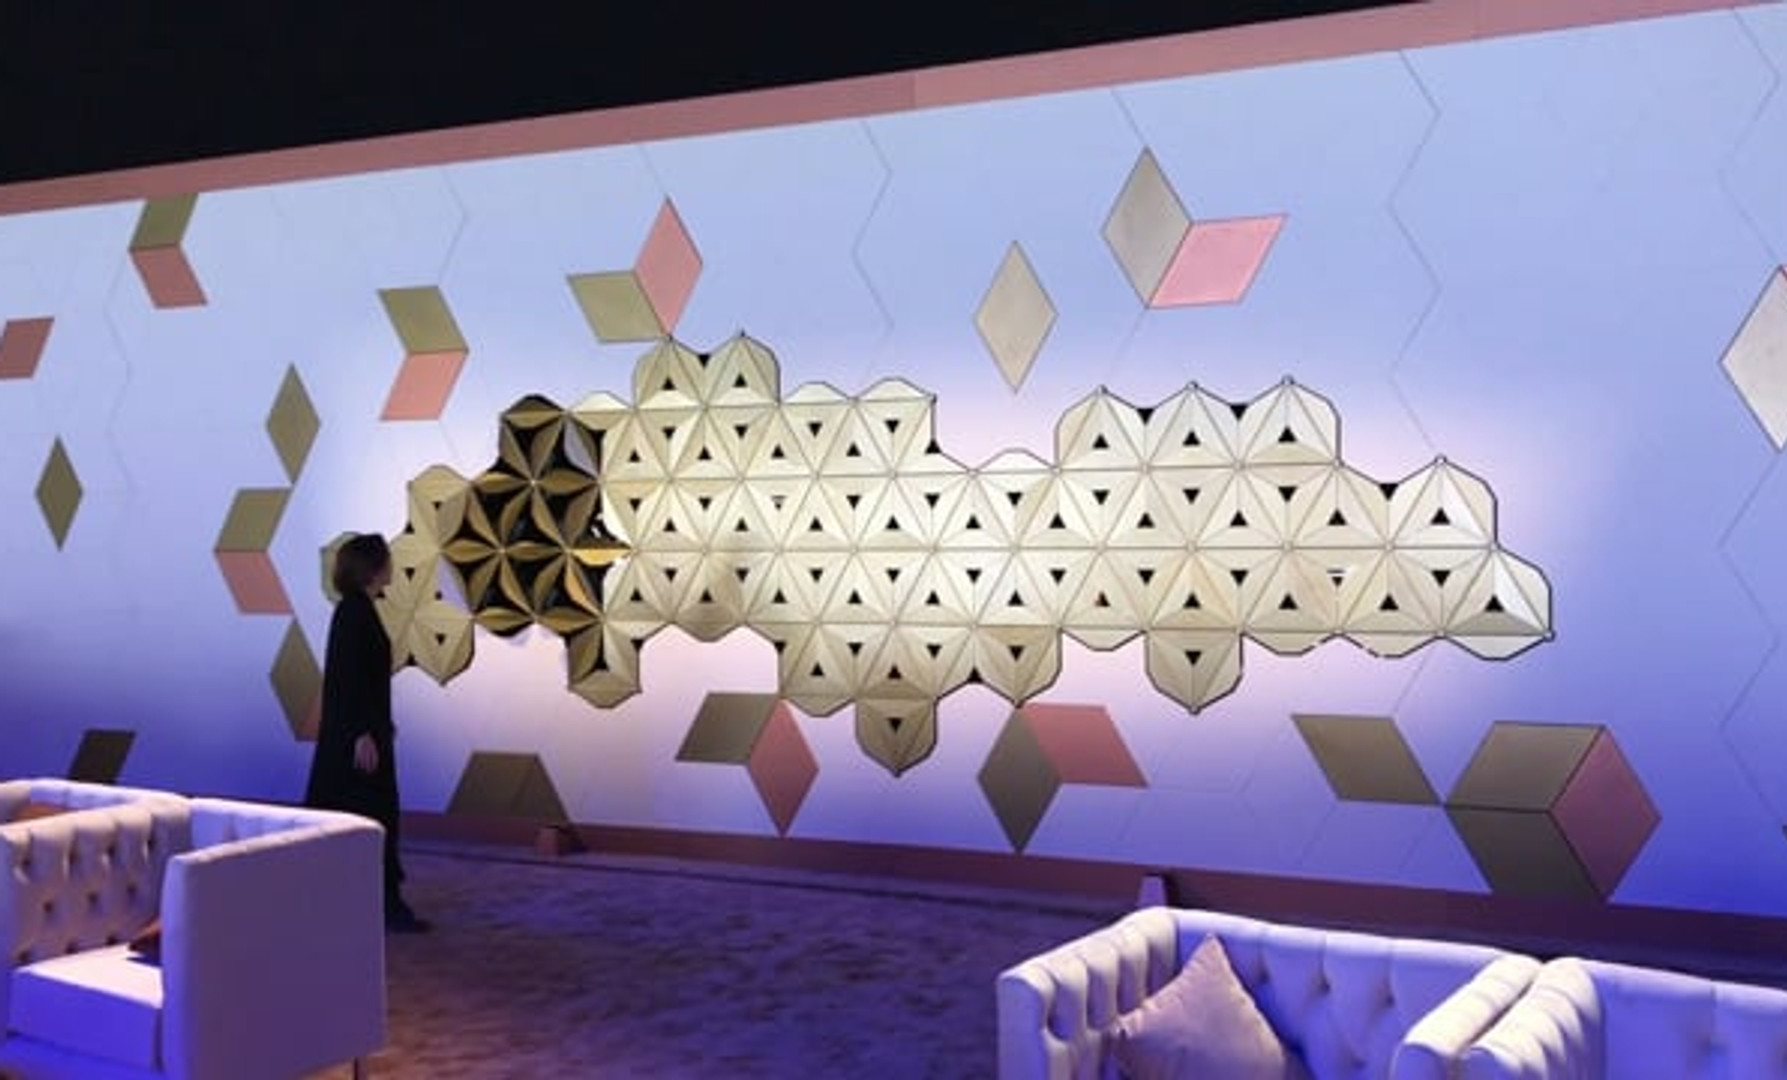 Al-Ula Kinetic Wall (2018, Leva)